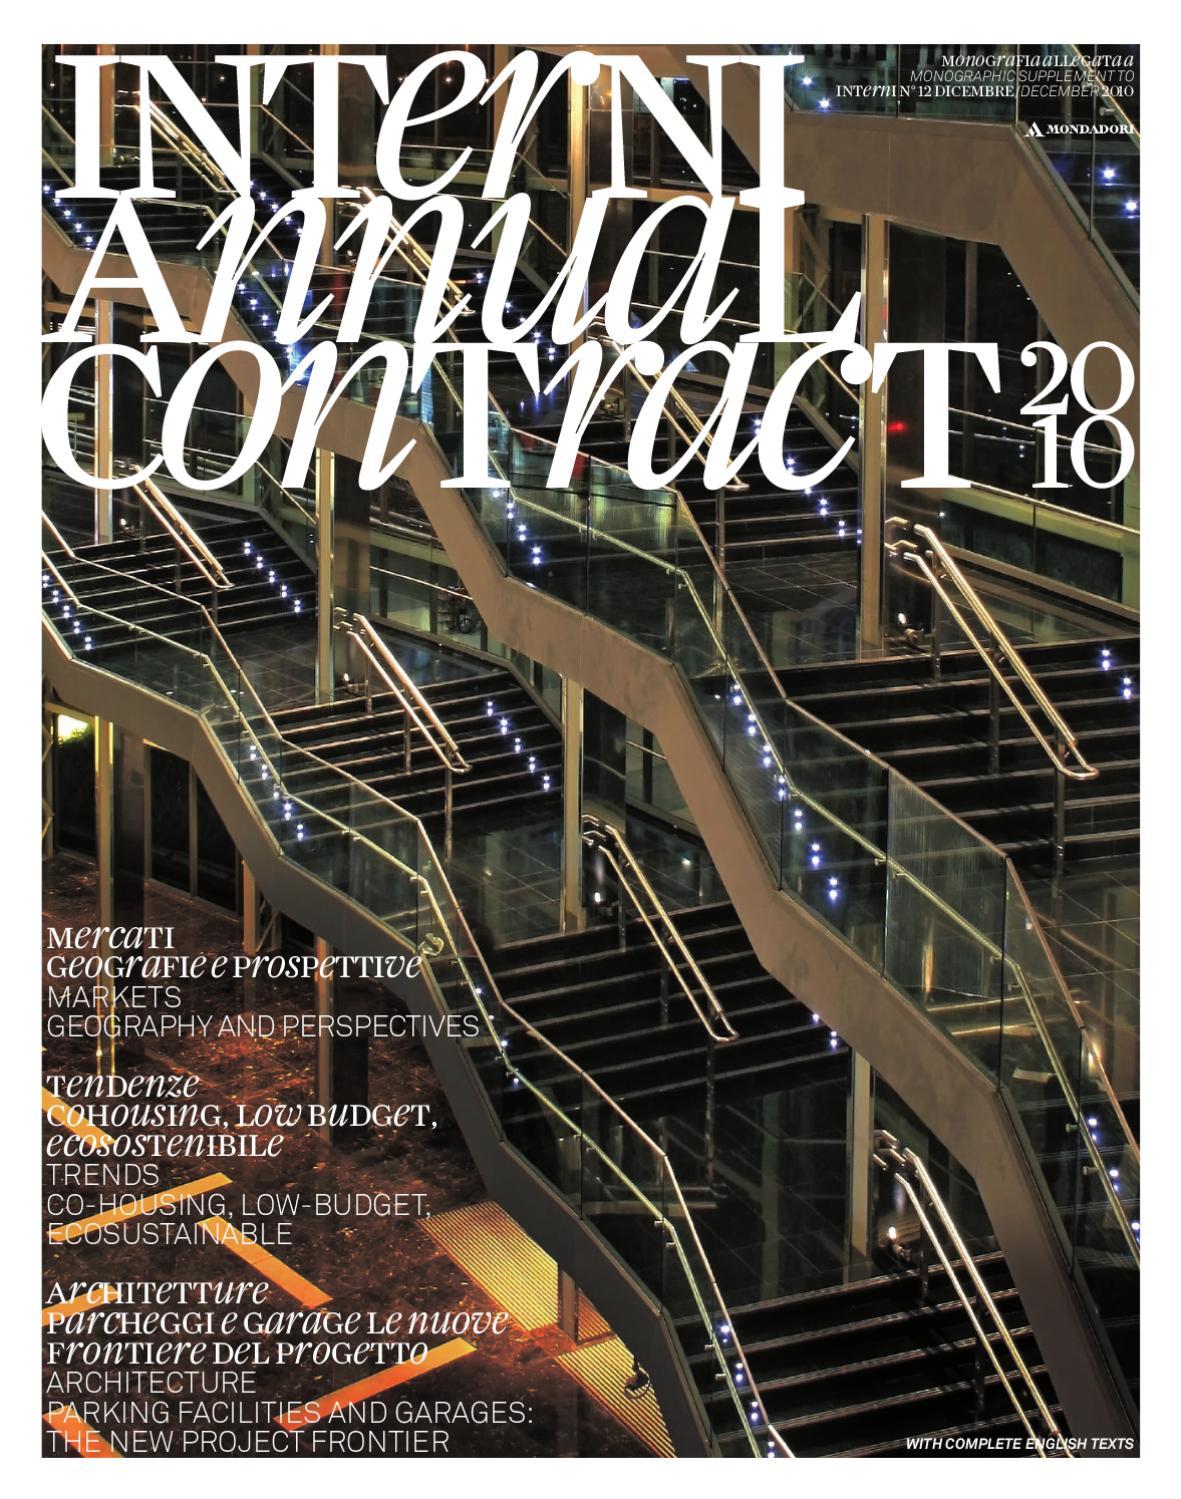 Interni Annual Bagno 2012 by Interni Magazine - issuu